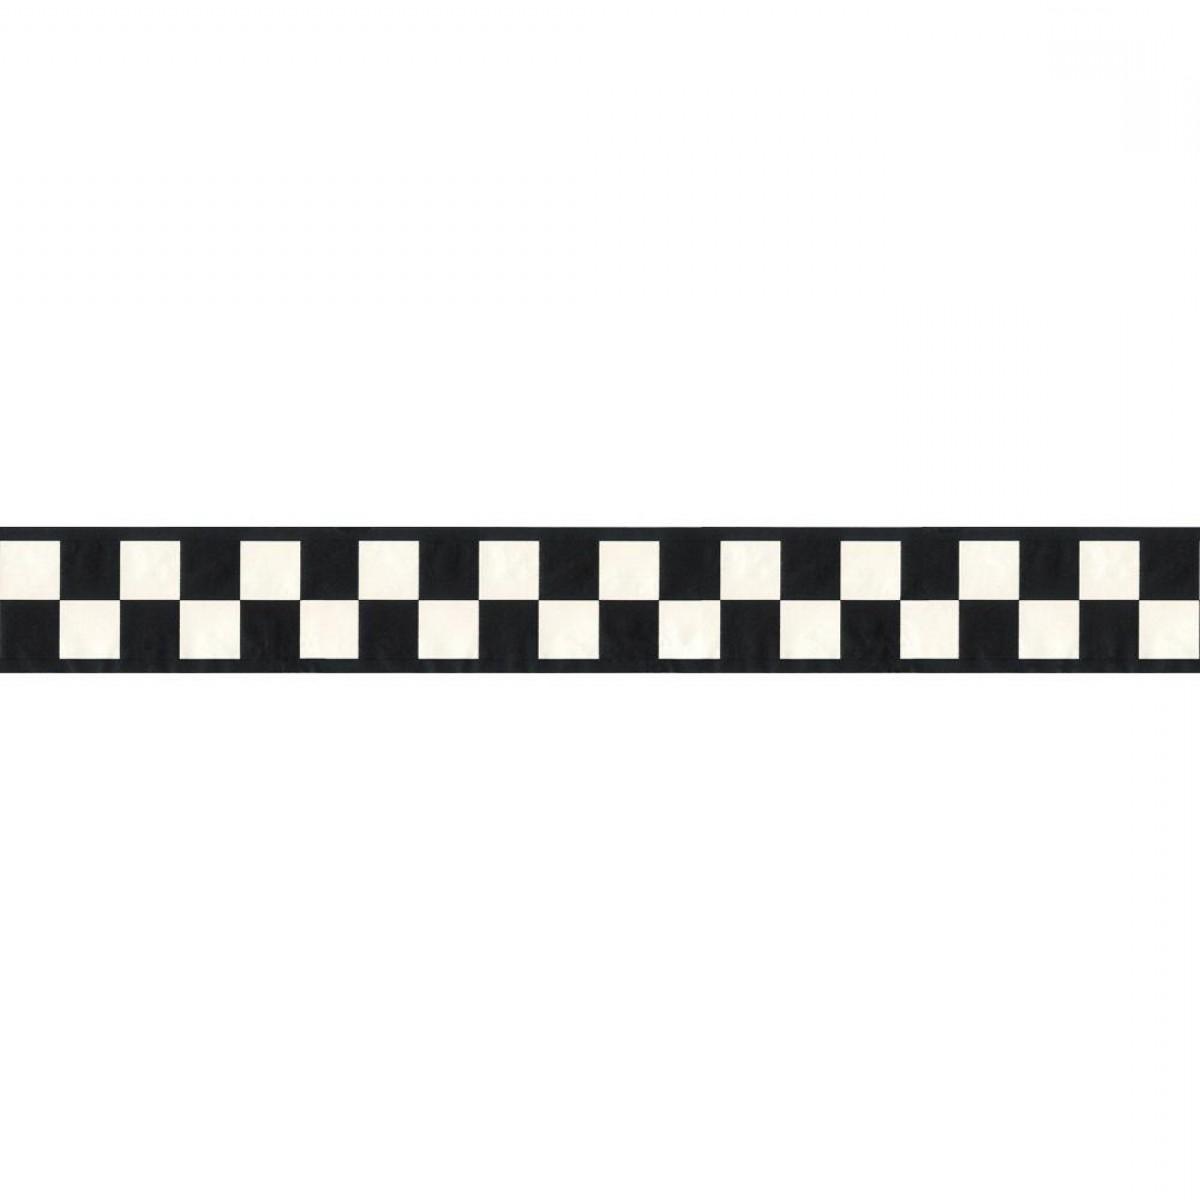 Checker border black and white clipart free svg freeuse Free Checkered Border Cliparts, Download Free Clip Art, Free Clip ... svg freeuse